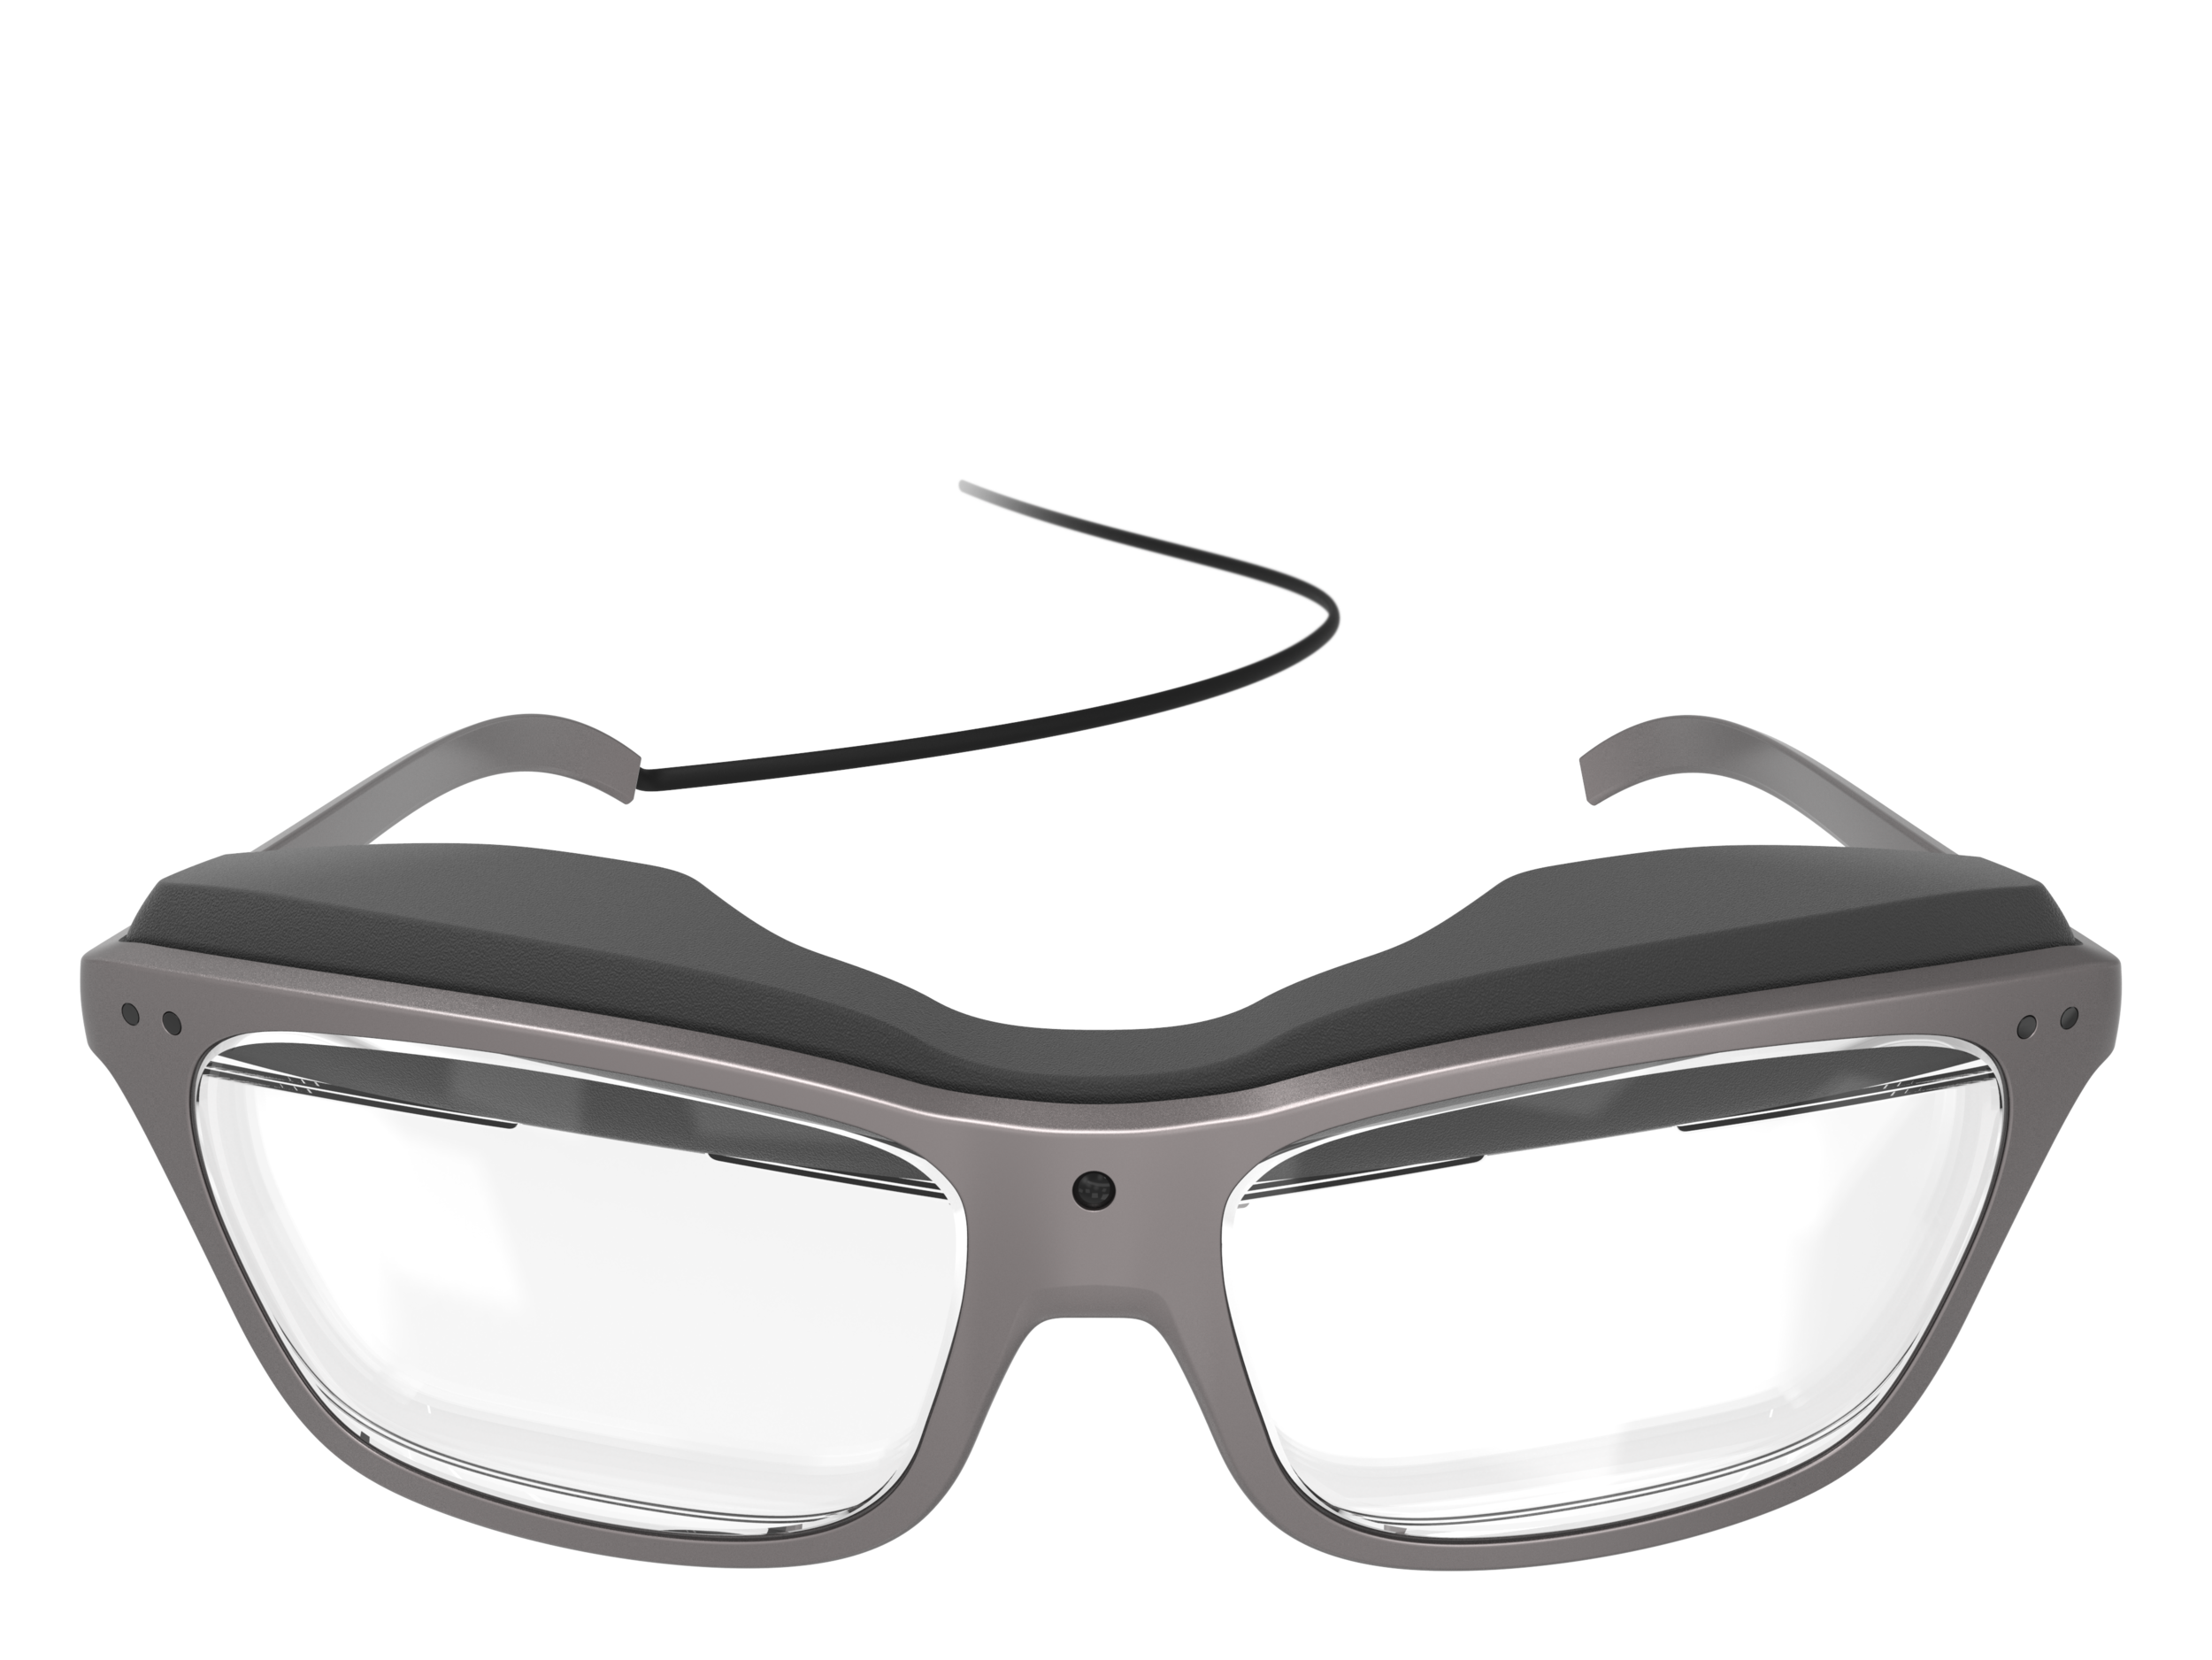 Front view of the man's concept design WaveOptics glasses